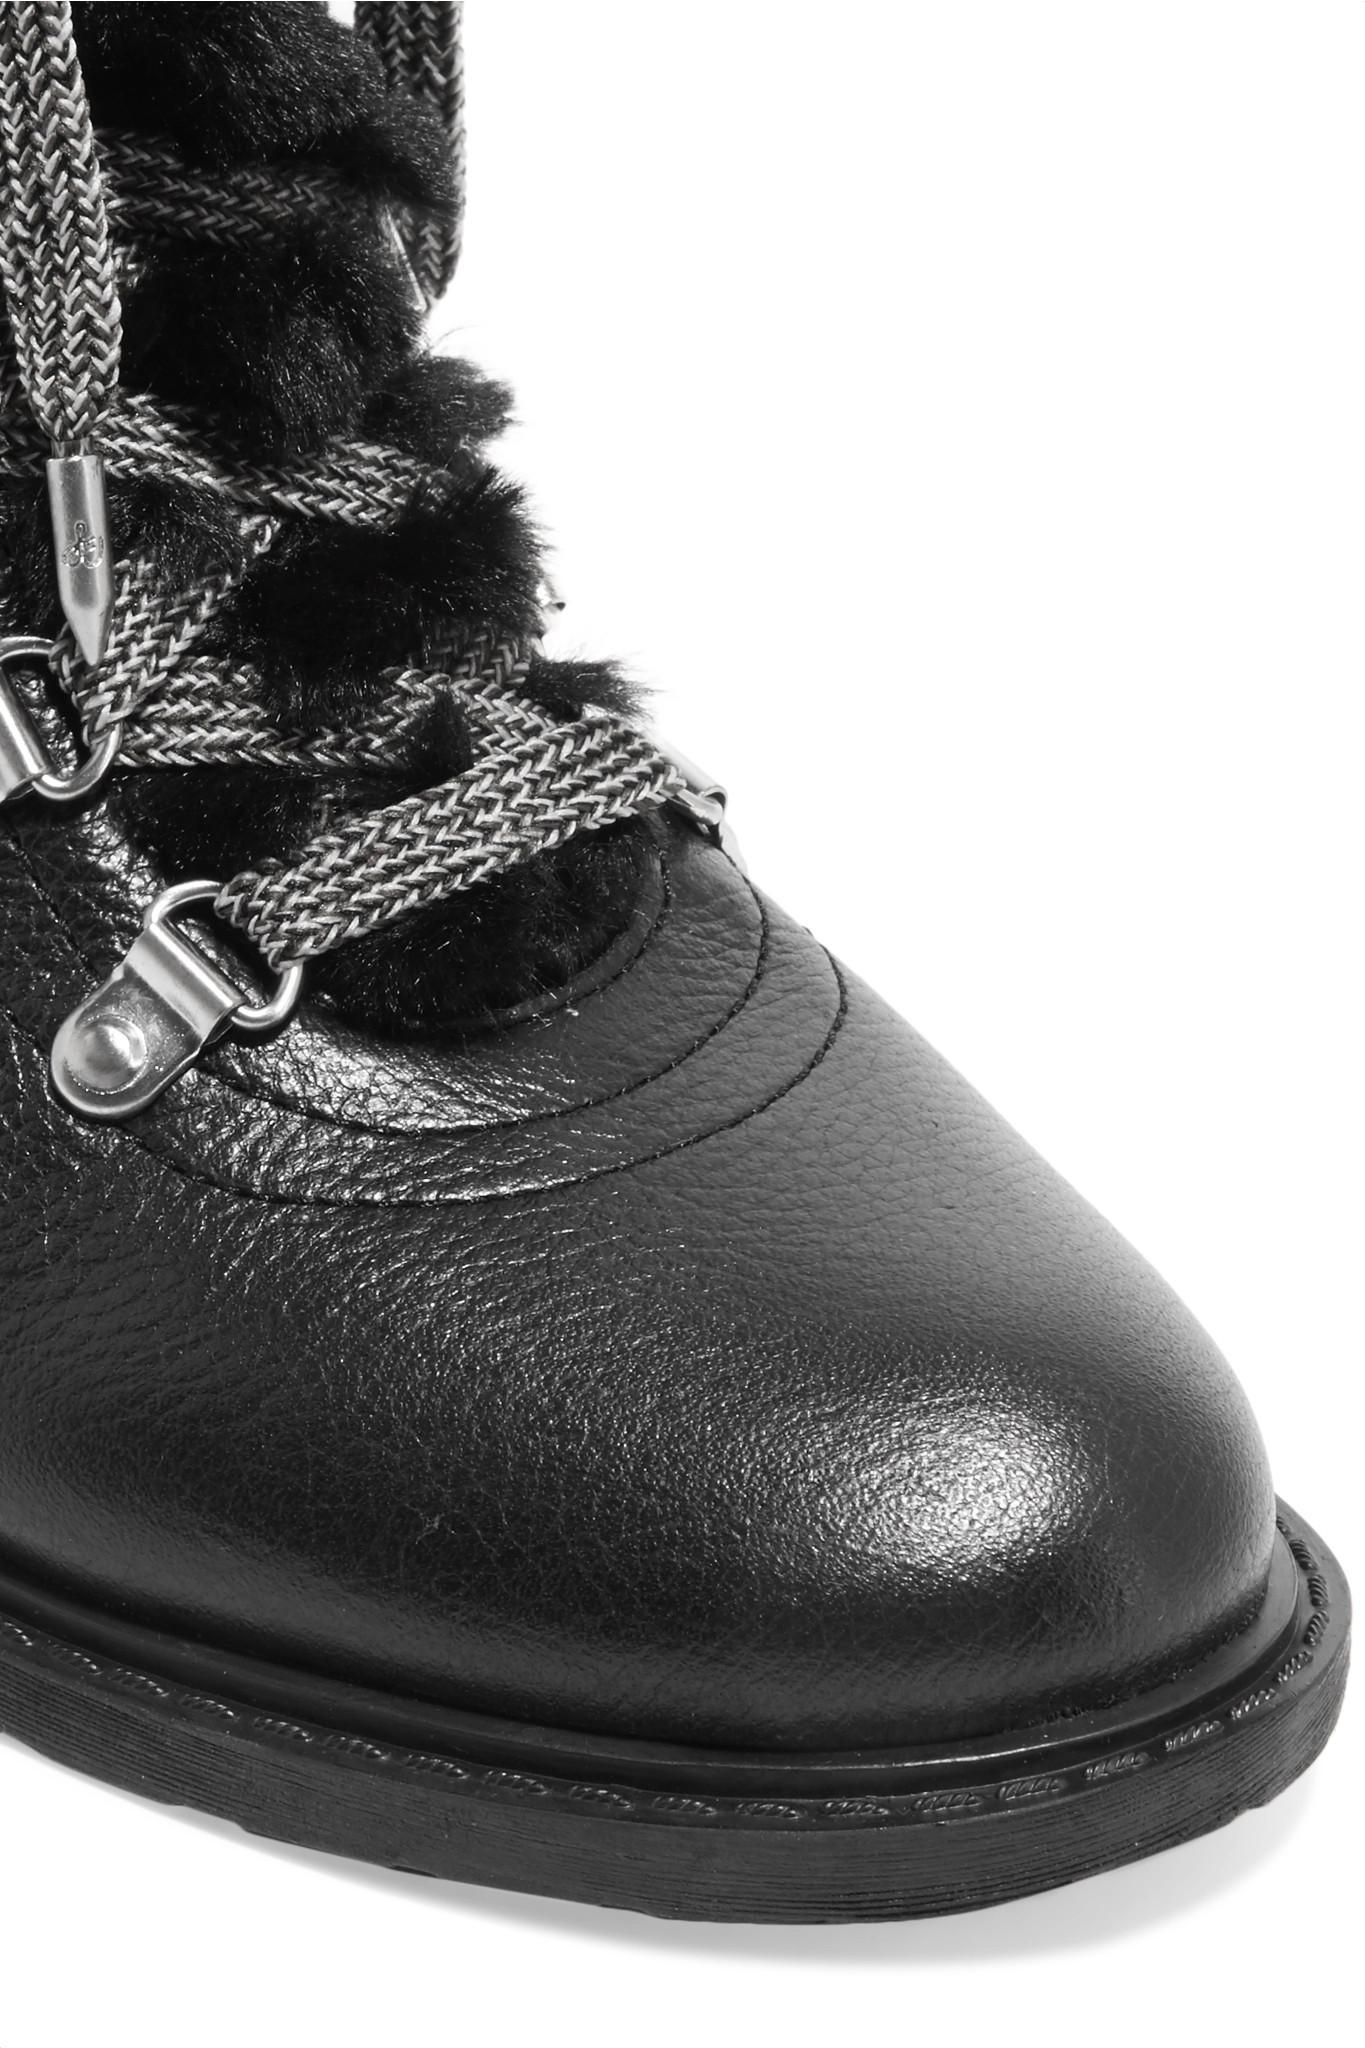 095322dd5f1d Lyst - Sam Edelman Darrah Faux Fur-trimmed Textured-leather Ankle ...